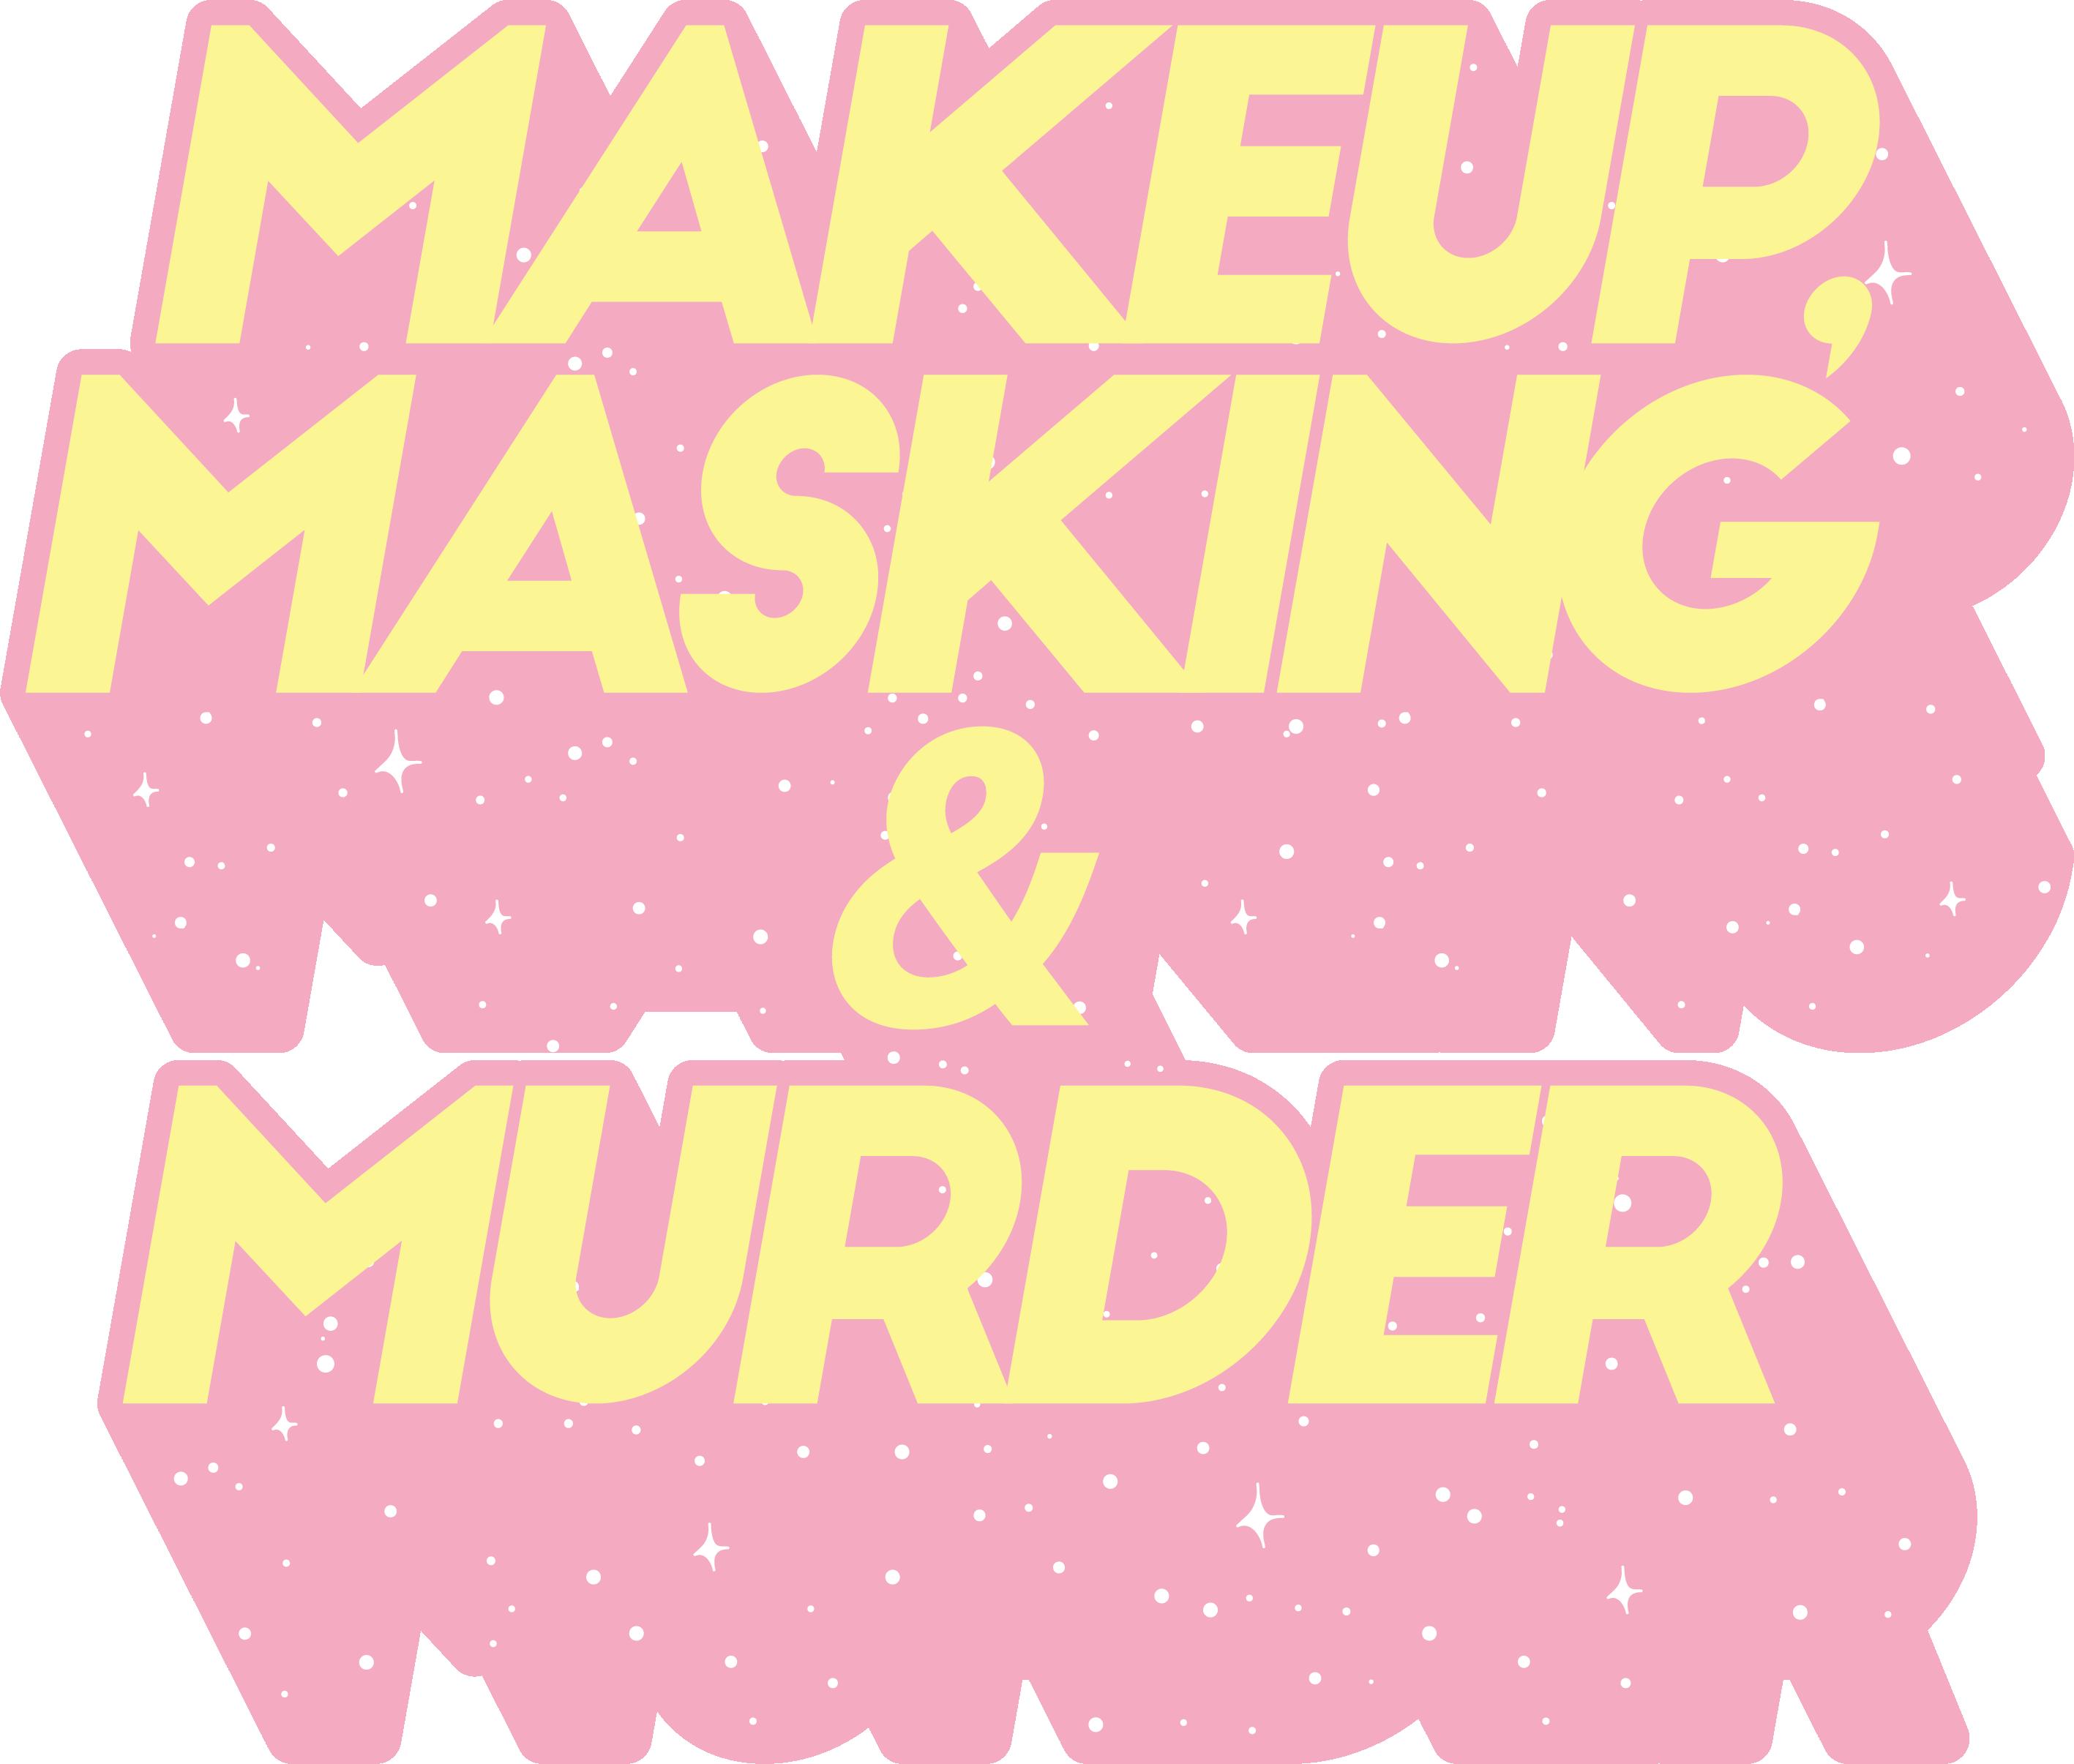 Makeup, Masking & Murder podcast